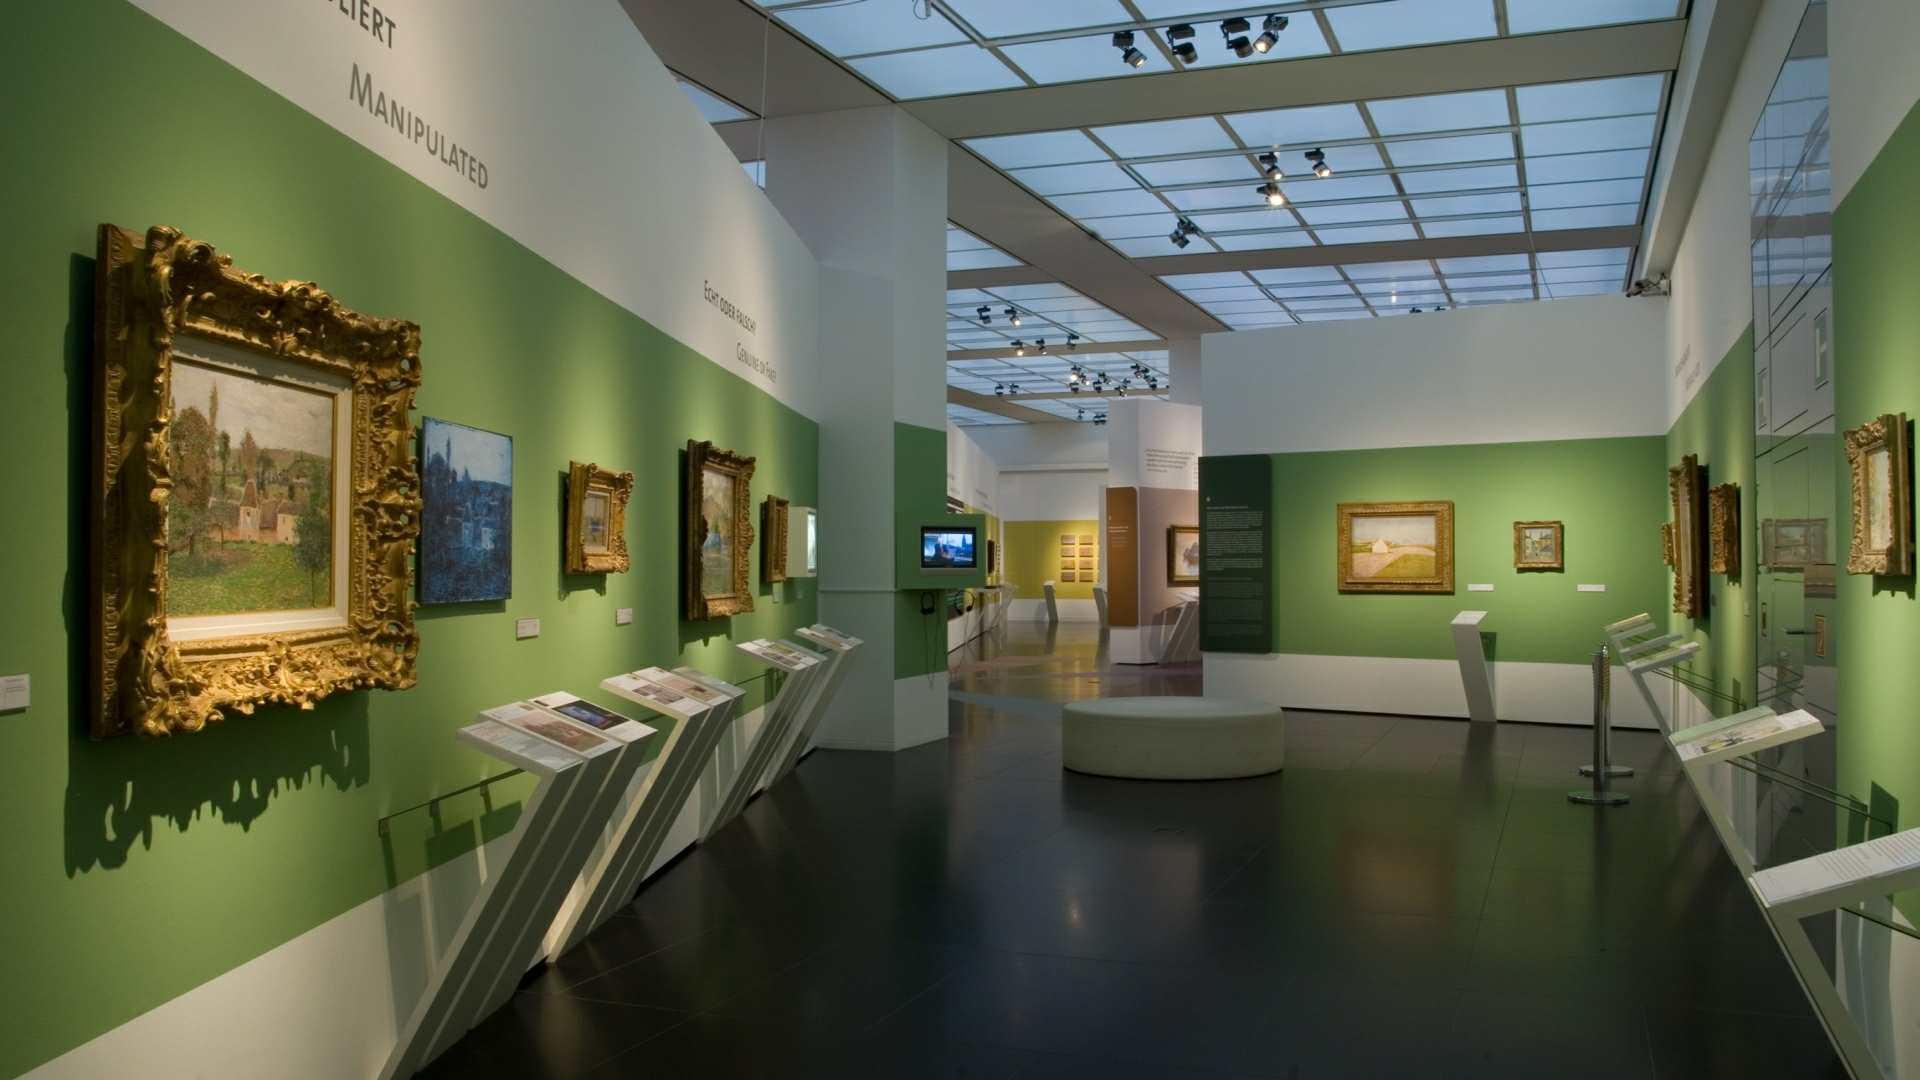 ref 15 - Museumsfilm